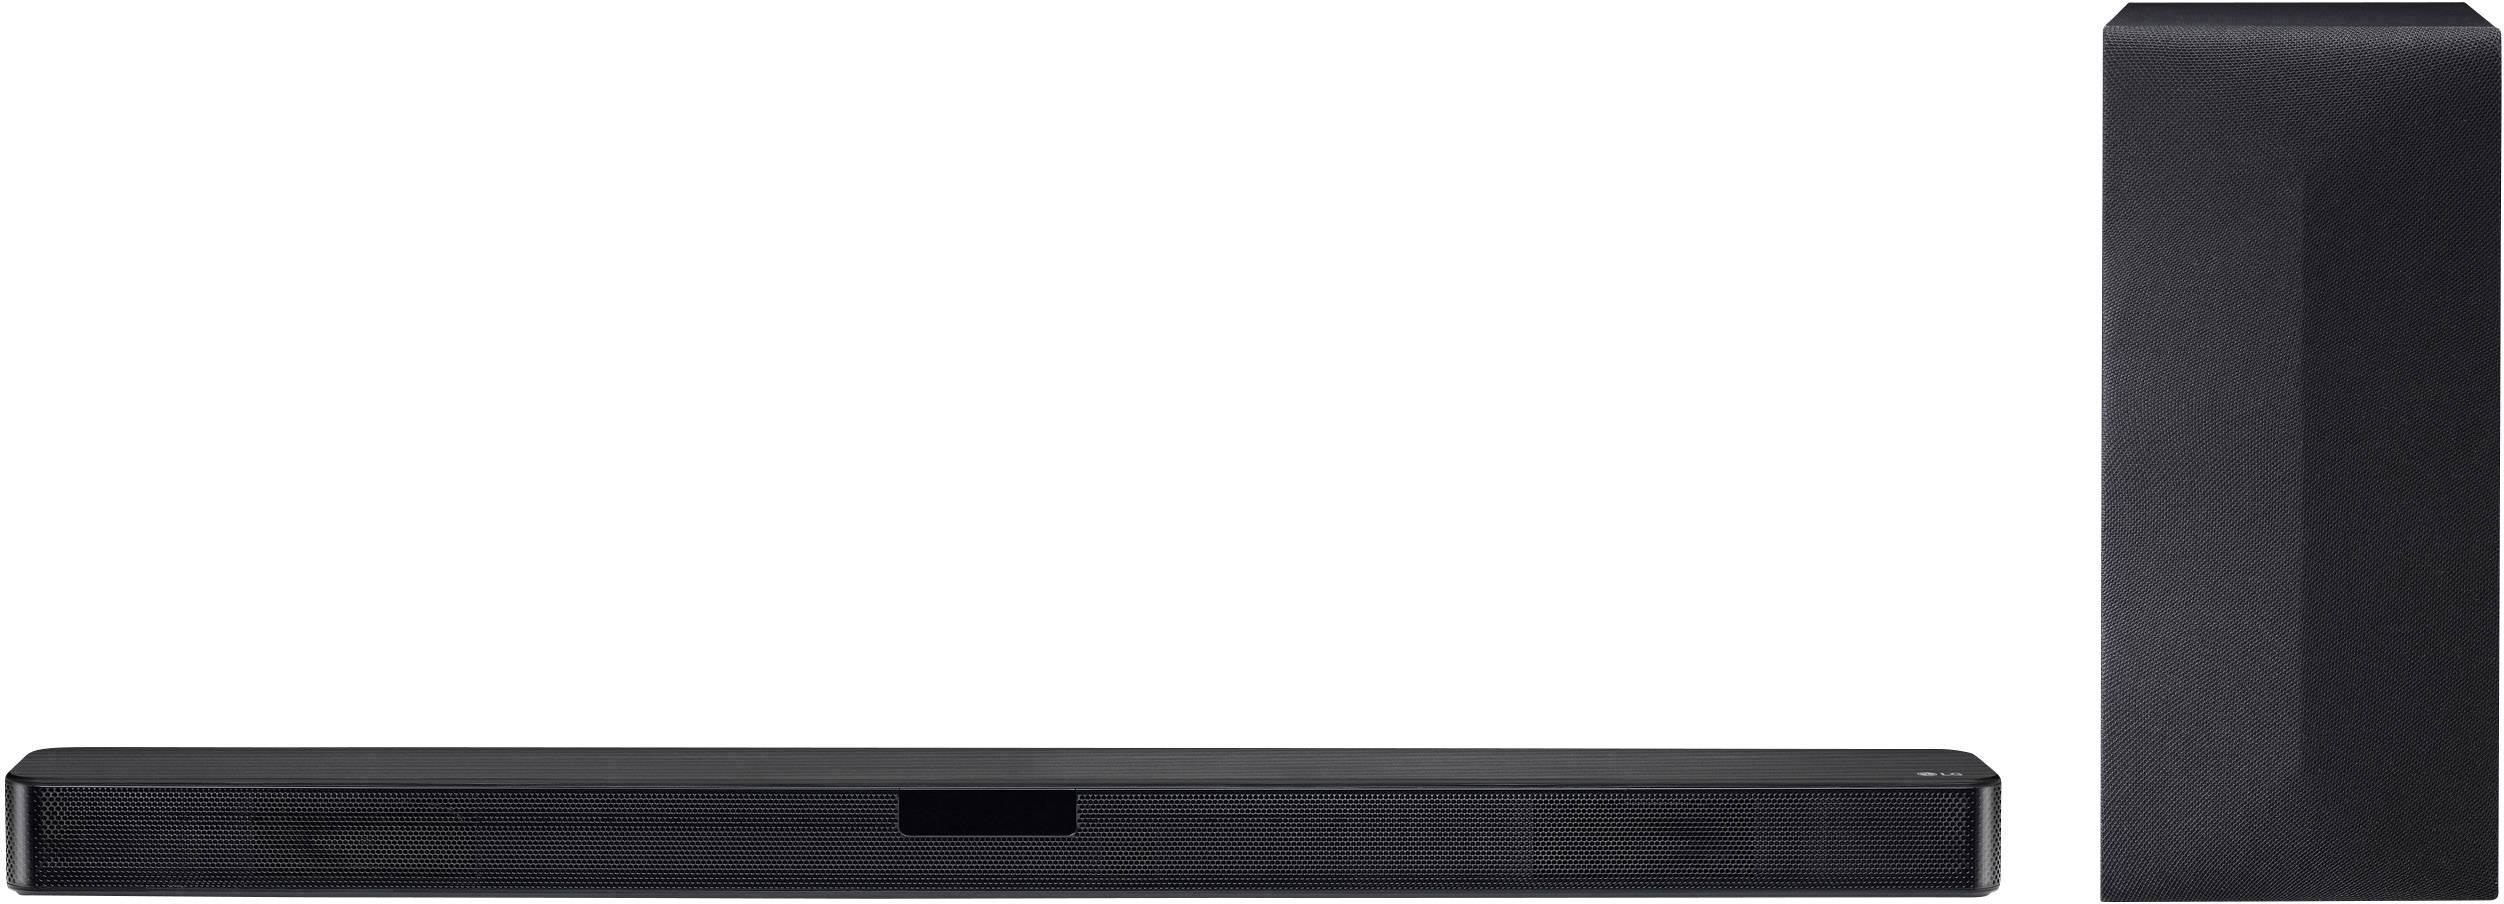 LG Electronics SL4 Soundbar Black Bluetooth, incl  cordless